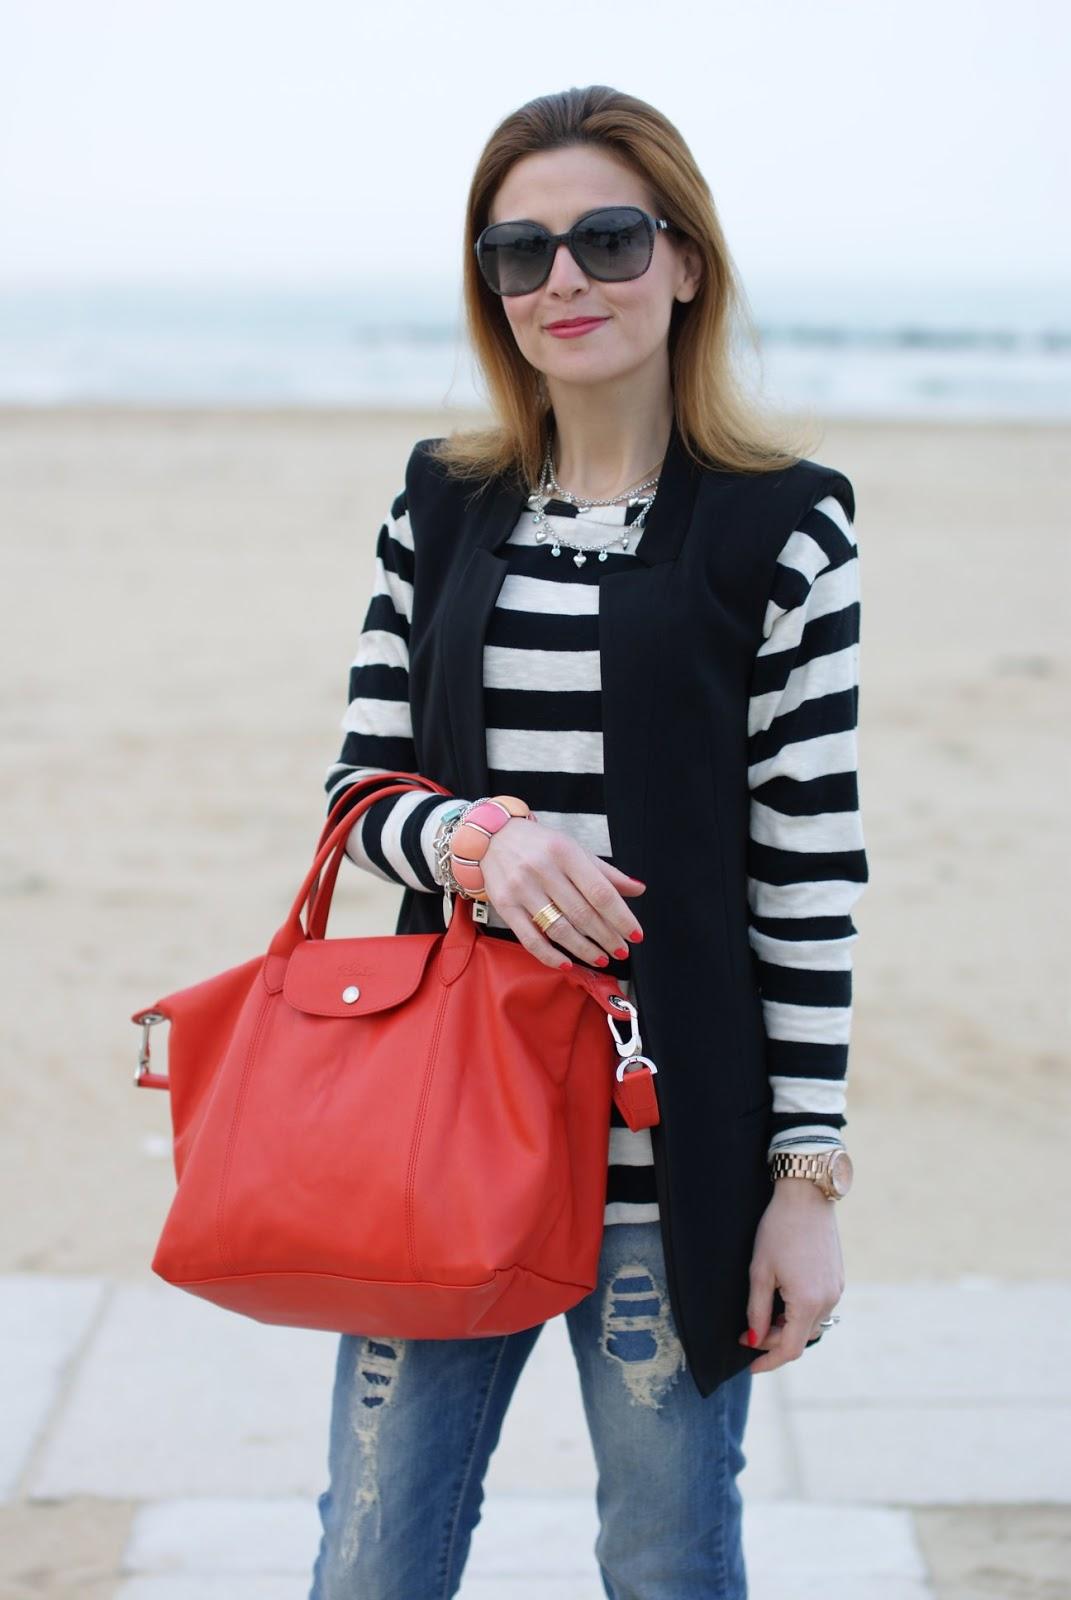 Longchamp Bag Boyfriend Jeans And Stripes Fashion And